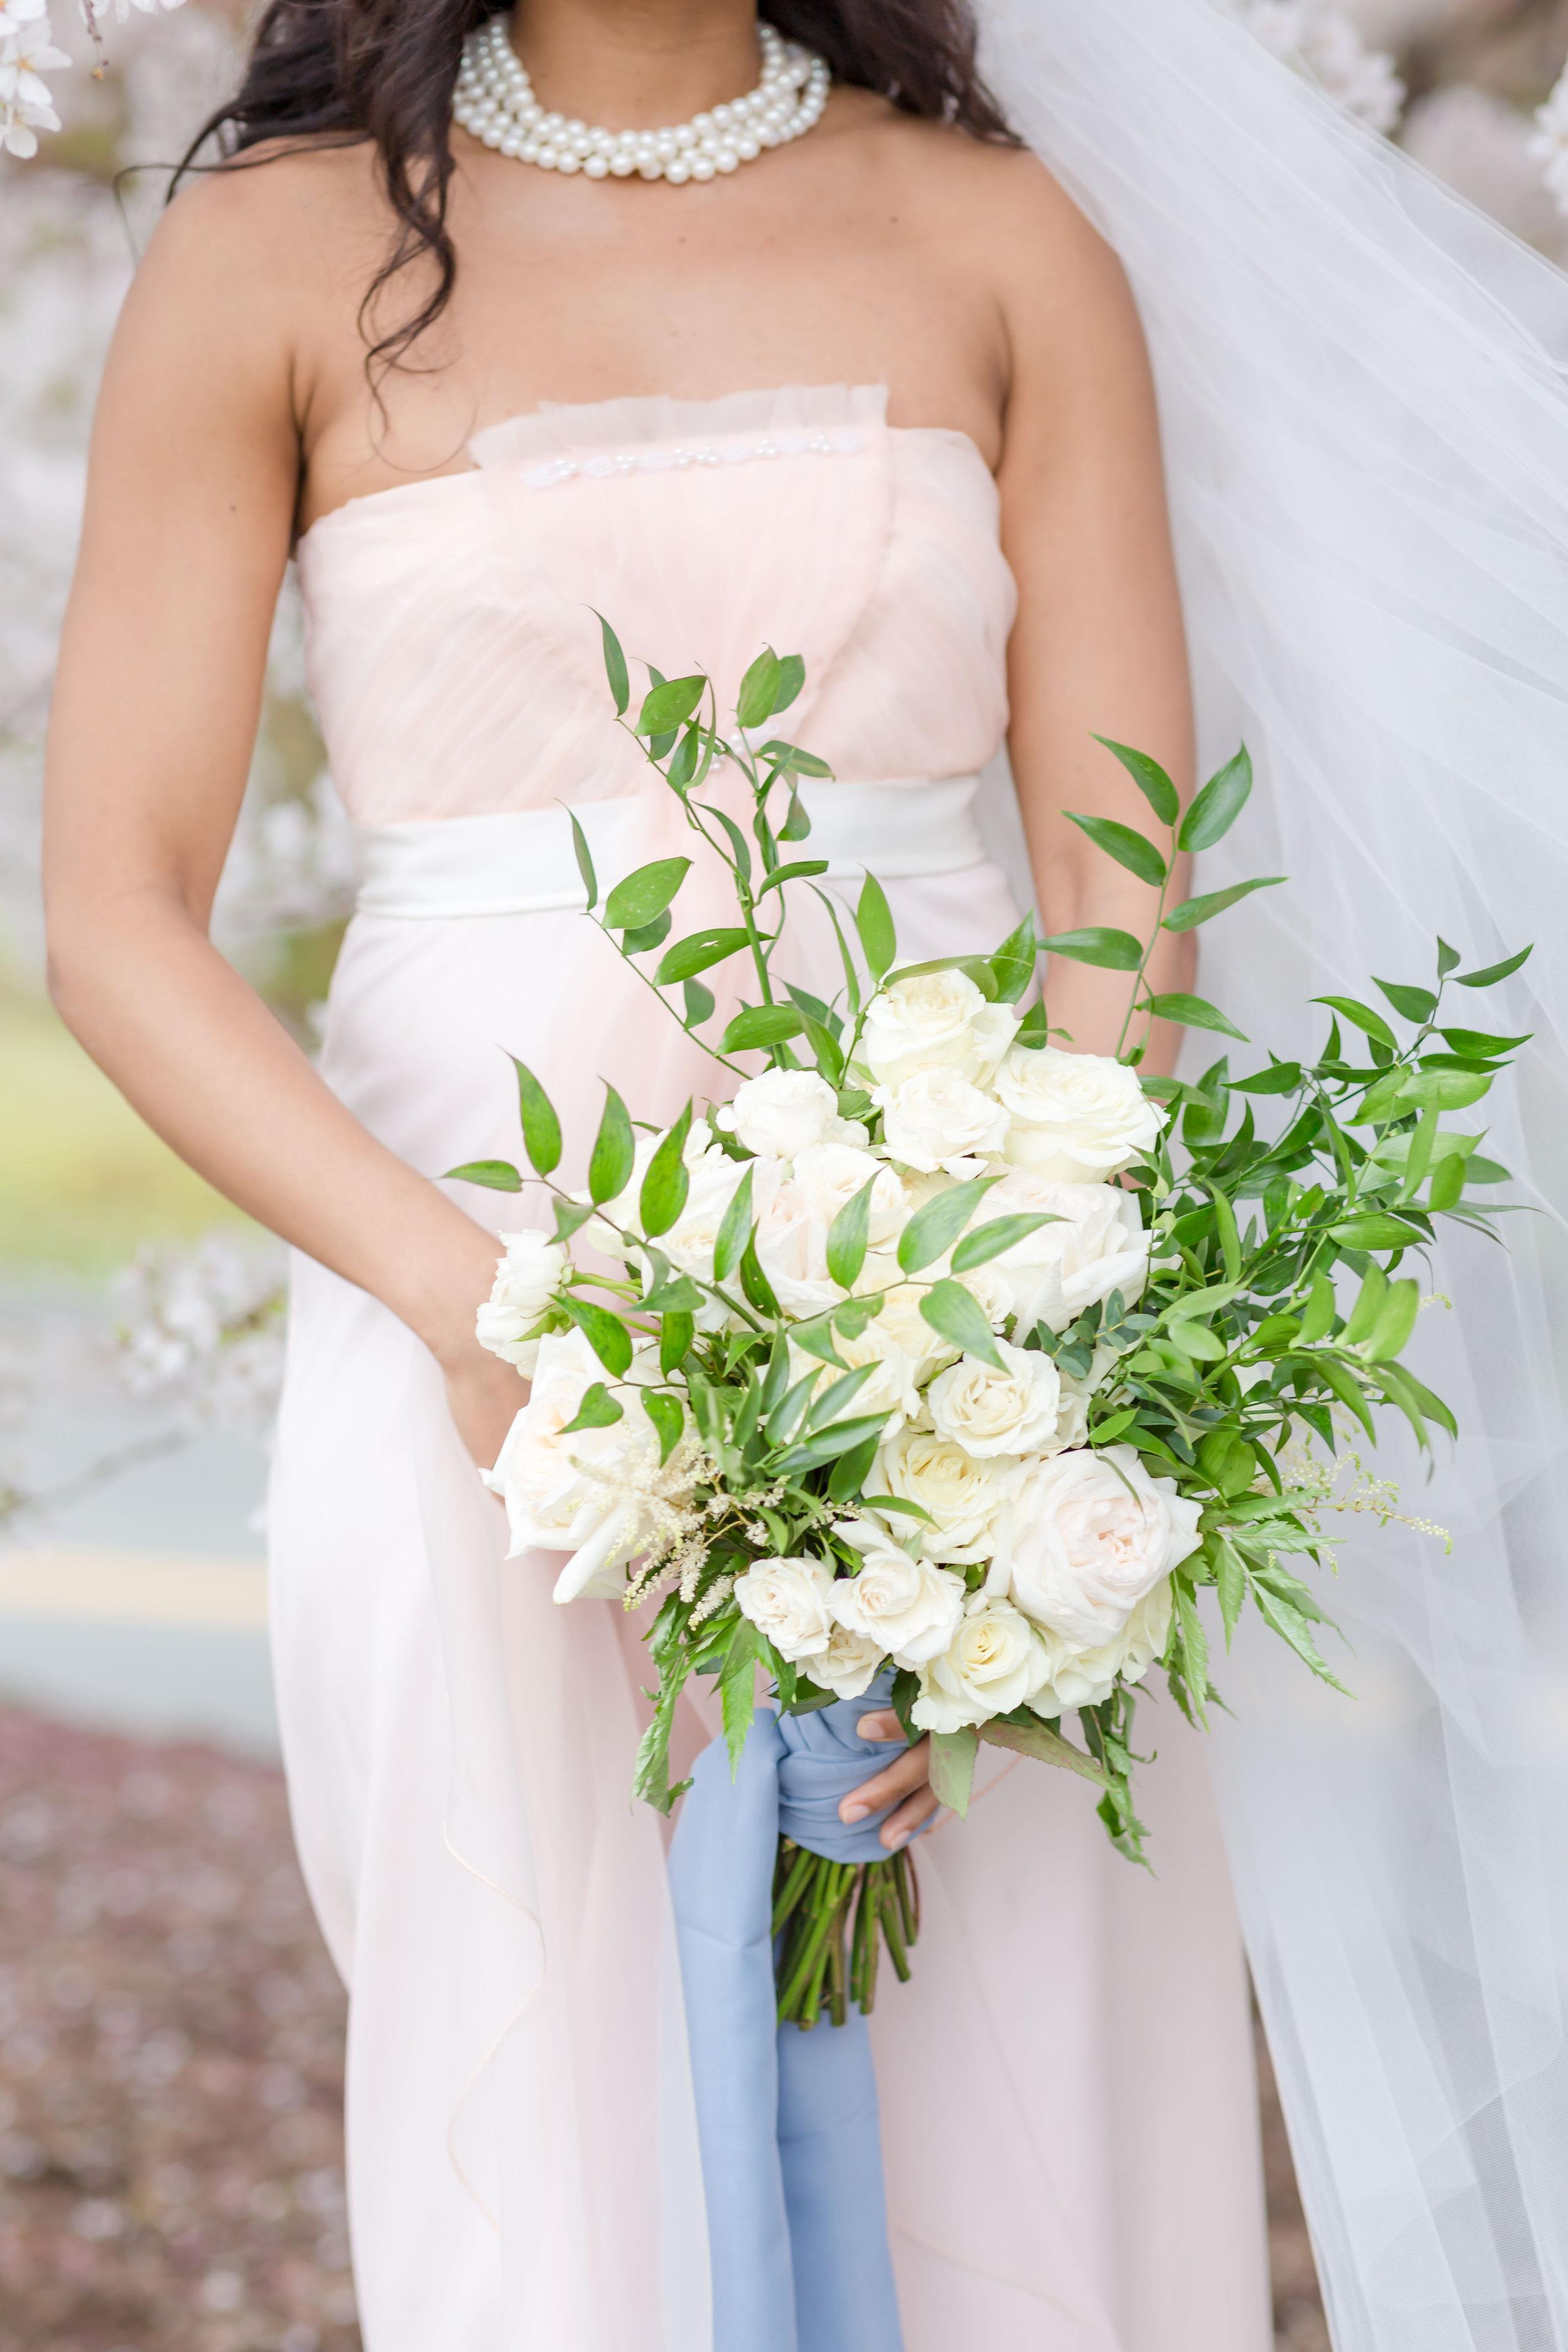 ScarlettExpressions-StyledShoot-Bridal-56.jpg